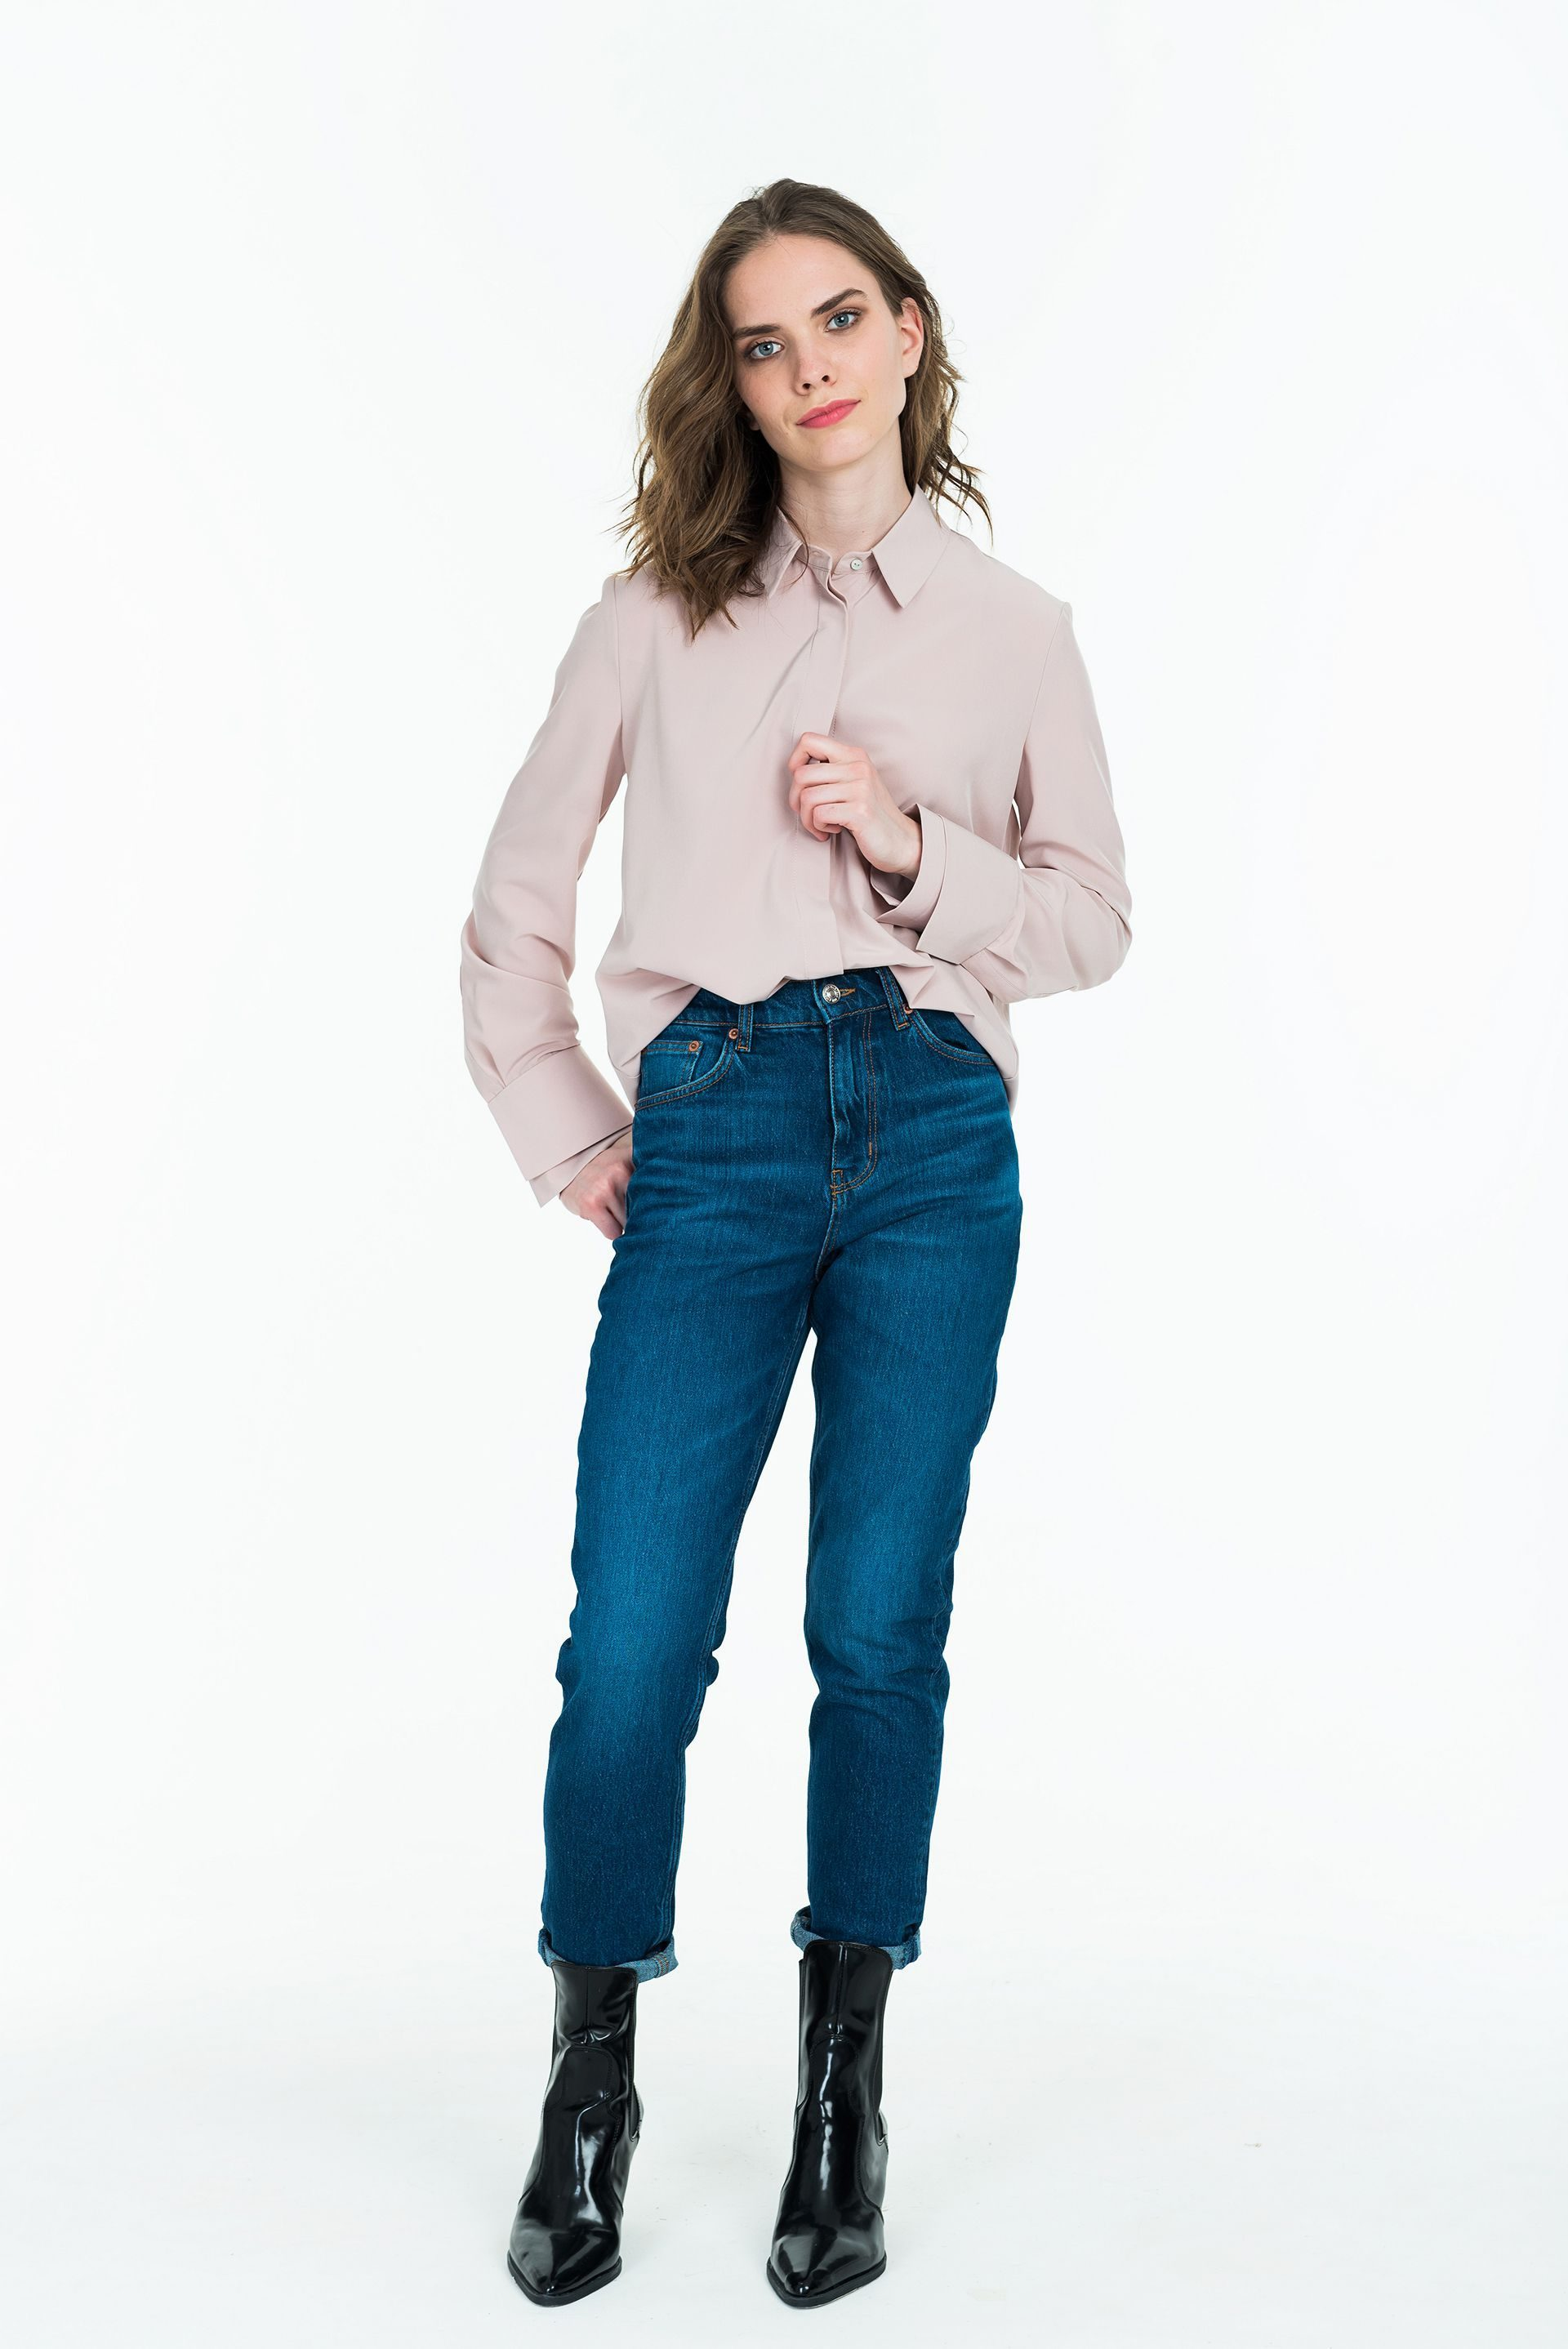 Рубашка бедно-розового цвета двойными манжетами